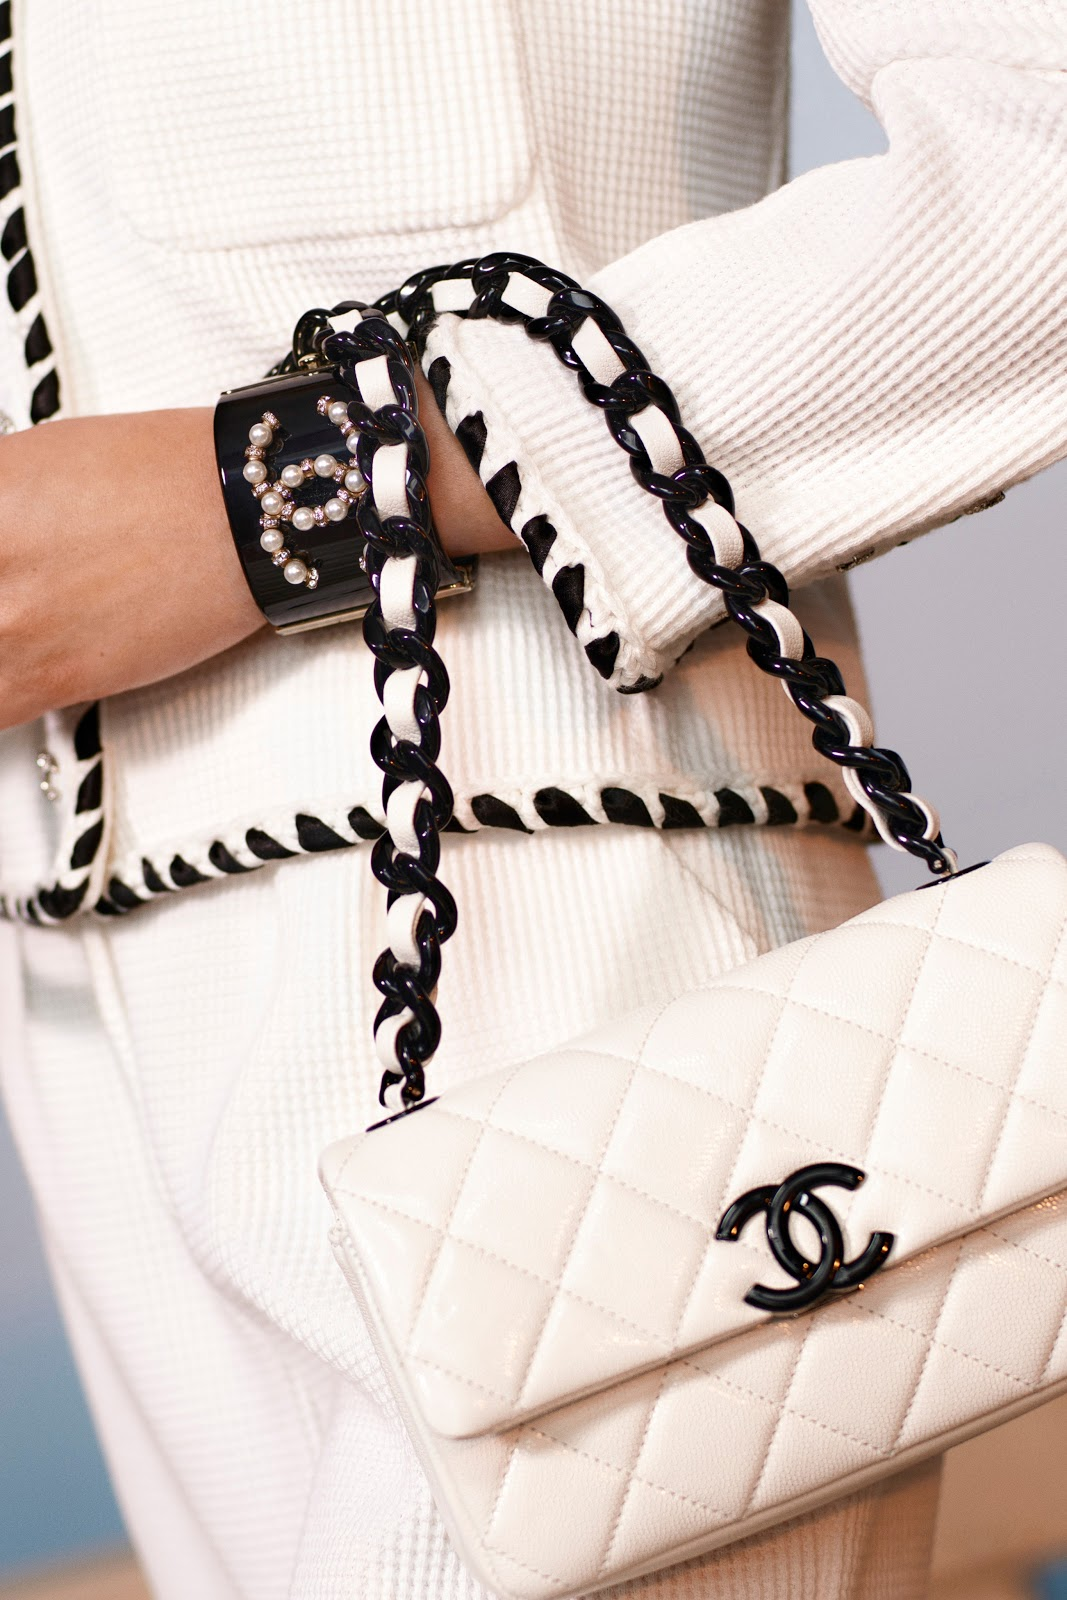 Fashion Inspiration: Chanel's First Digital Runway Show